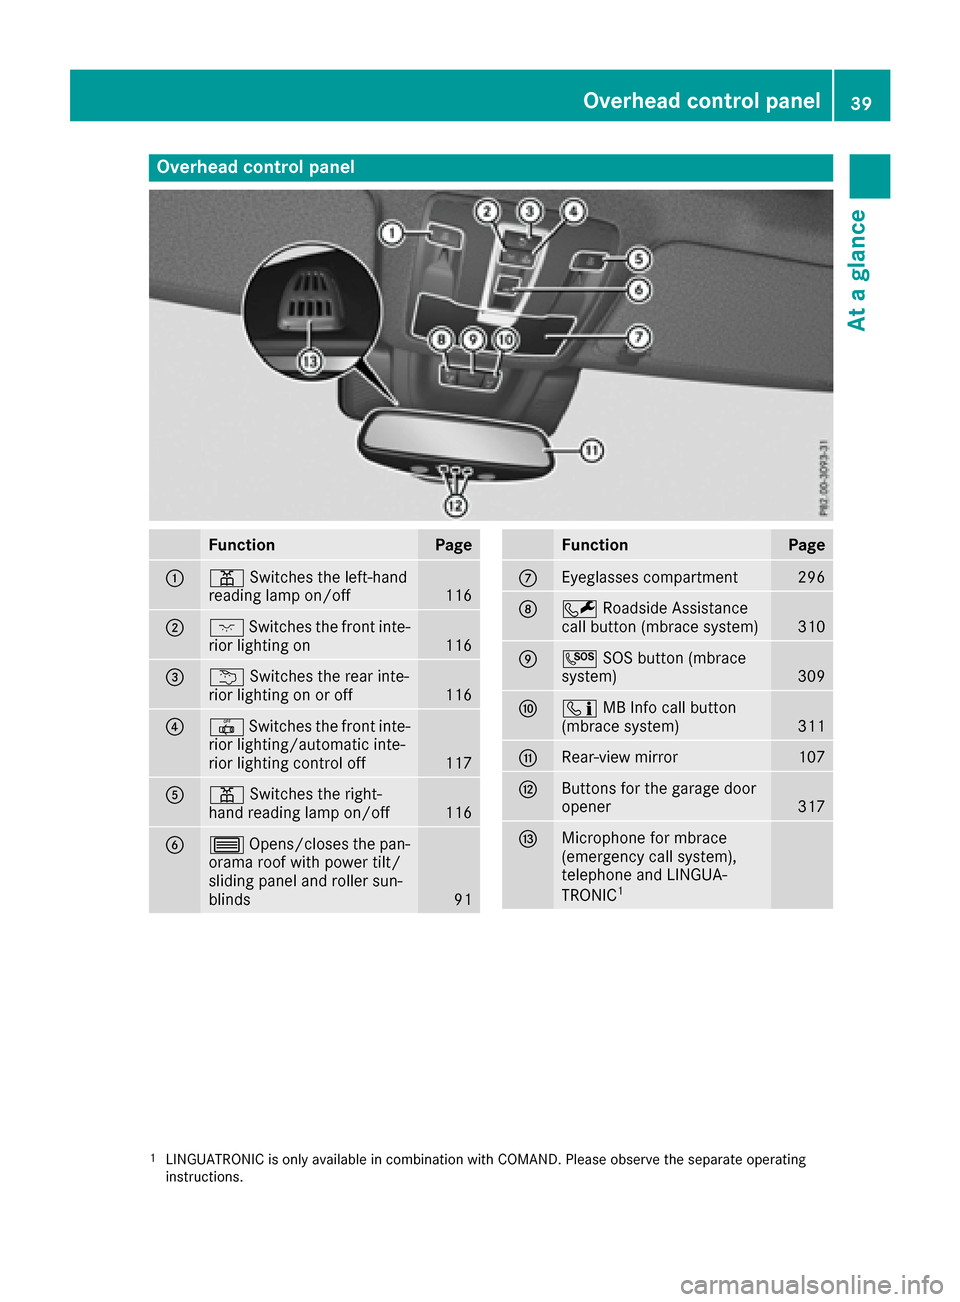 Mercedes benz gls class suv 2017 x166 service manual for Mercedes benz service manual